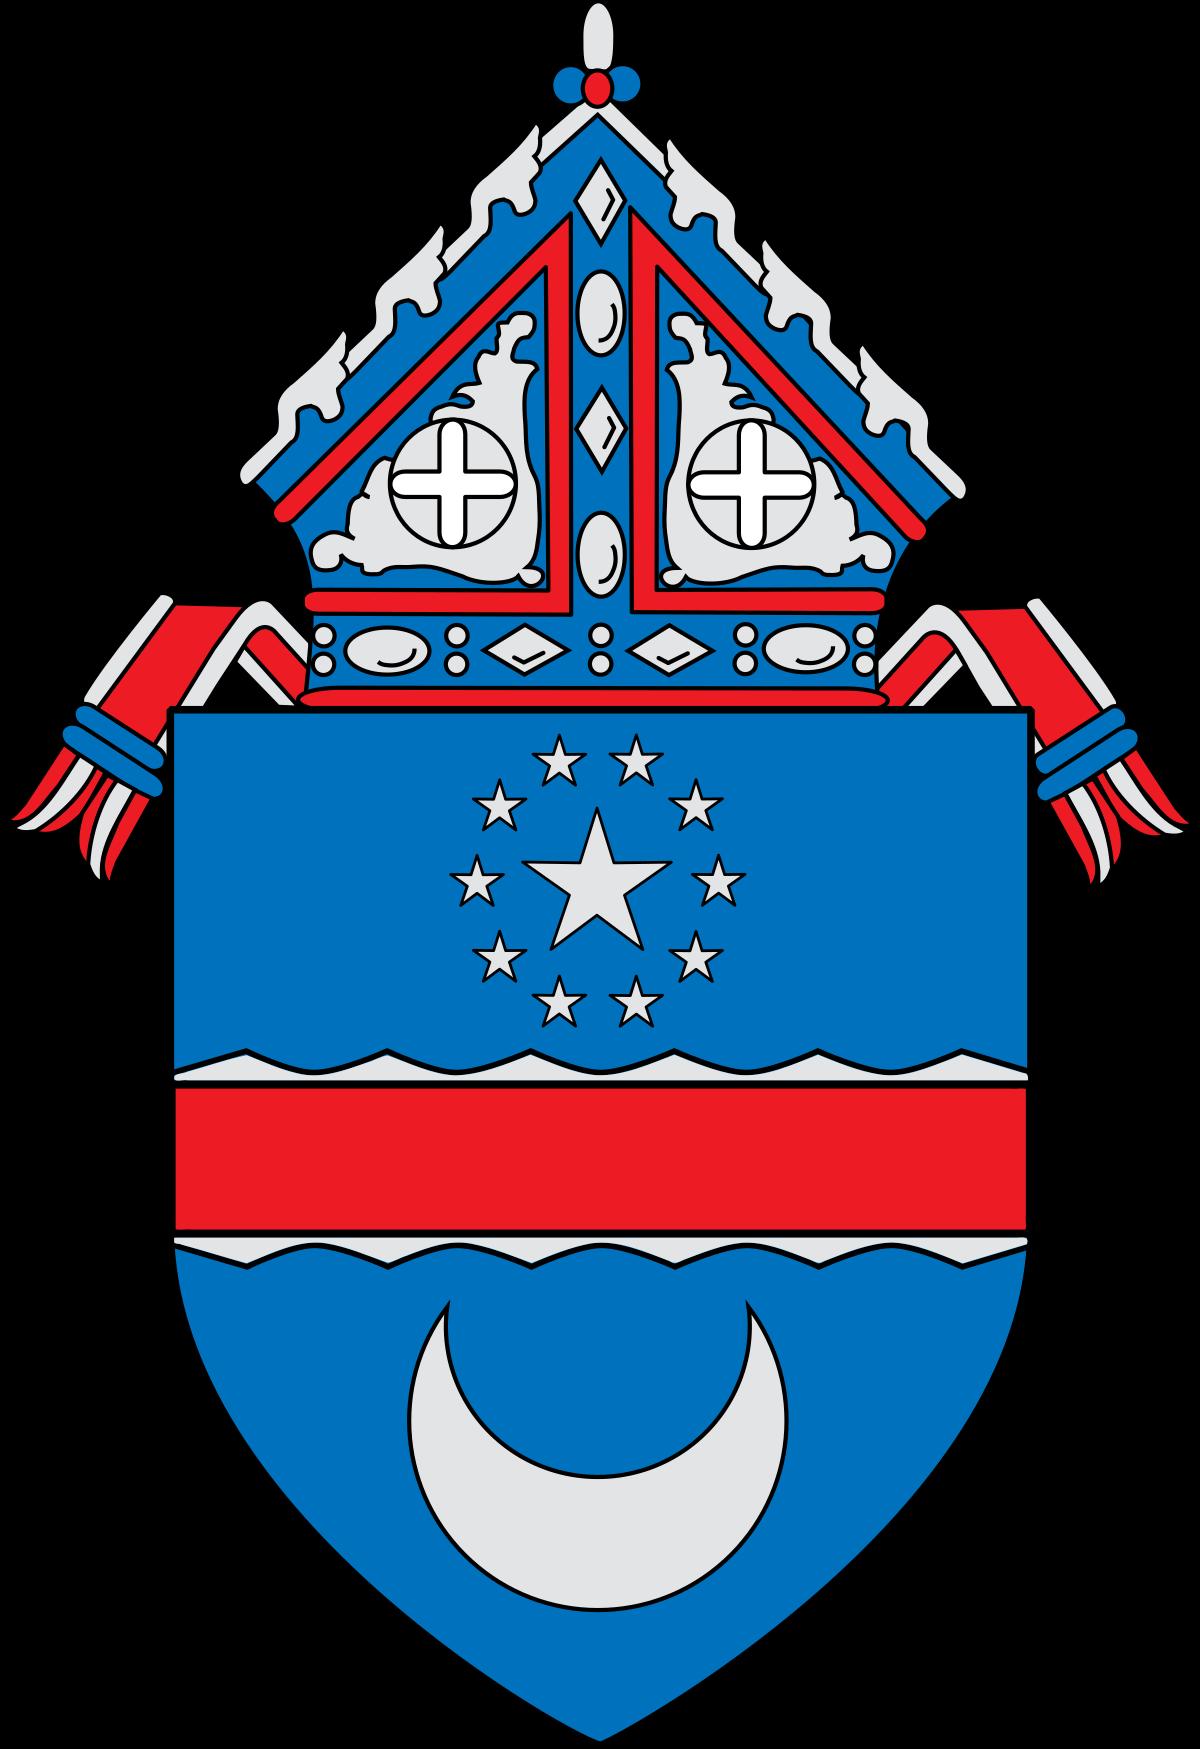 Pastor clipart catholic community. Roman diocese of arlington